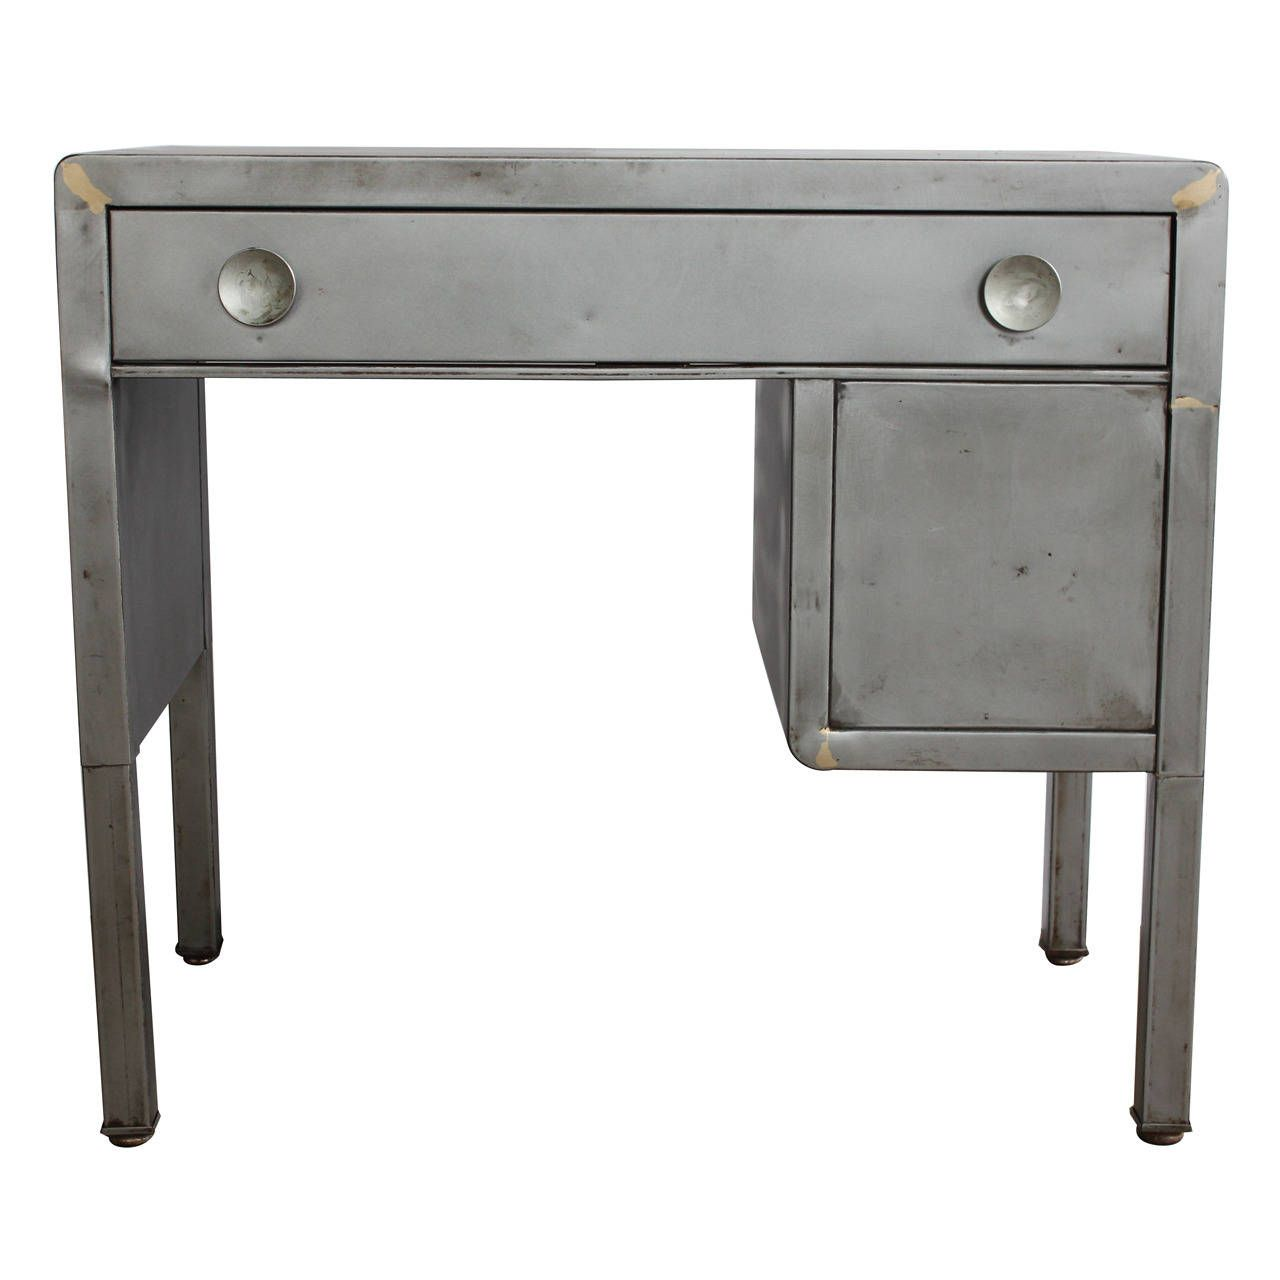 Visit - Vintage Industrial Metal Desk By Norman Bel Geddes Norman Bel